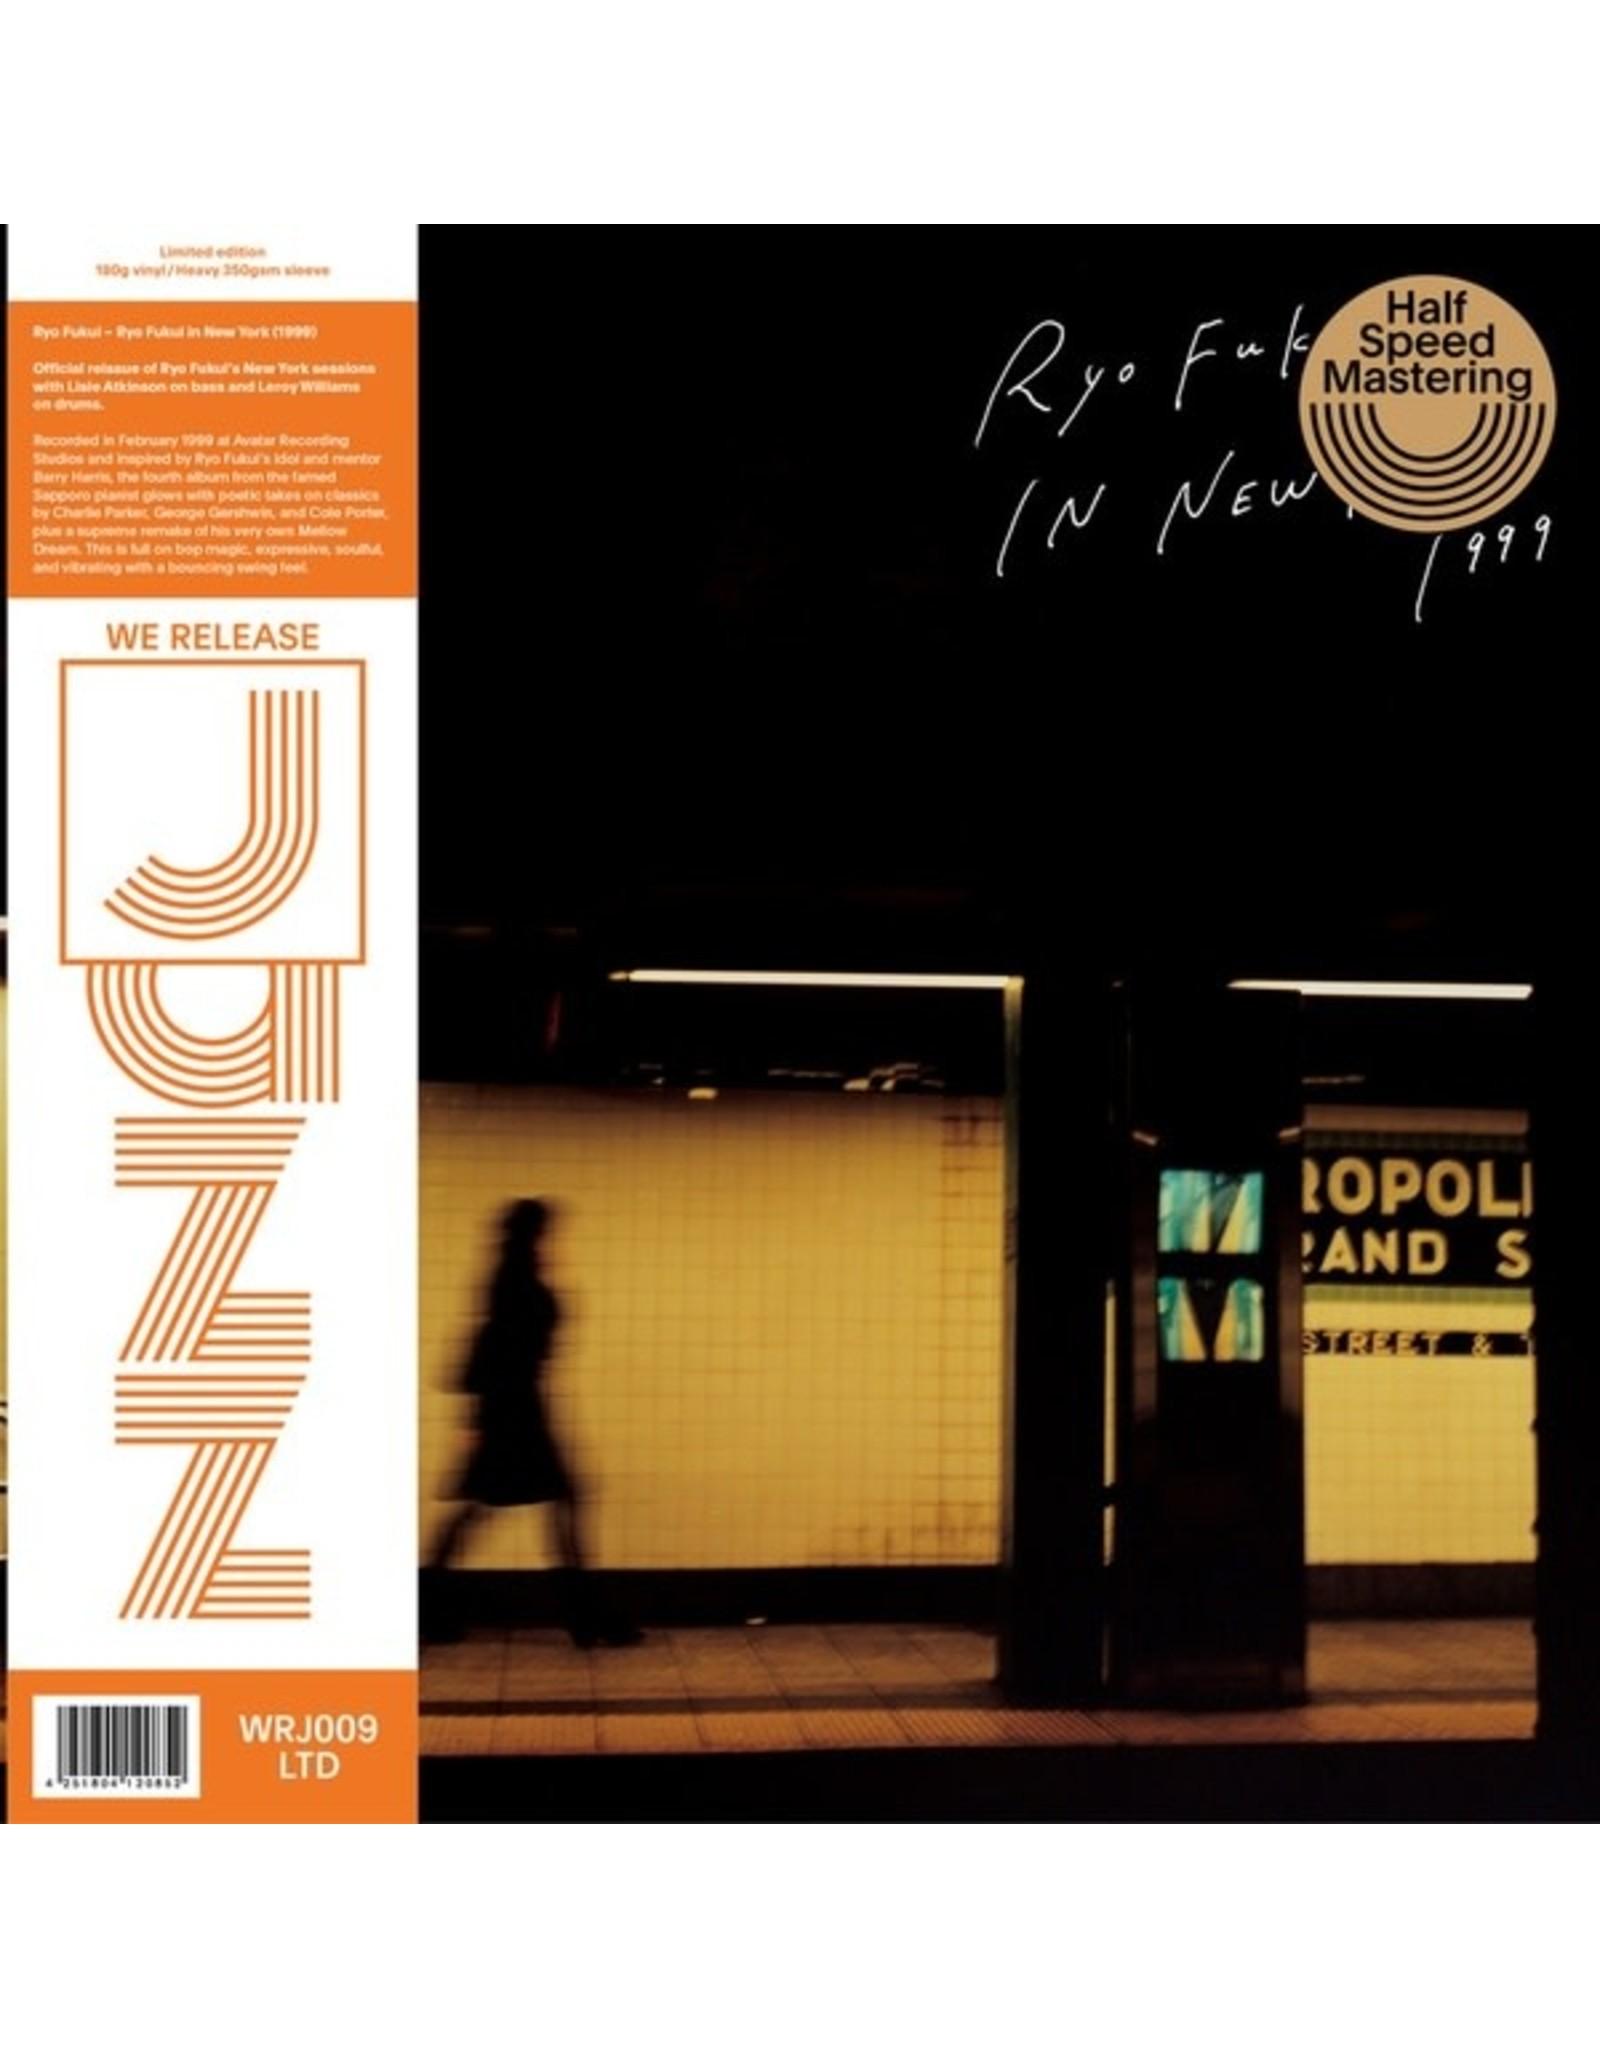 New Vinyl Ryo Fukui - In New York LP